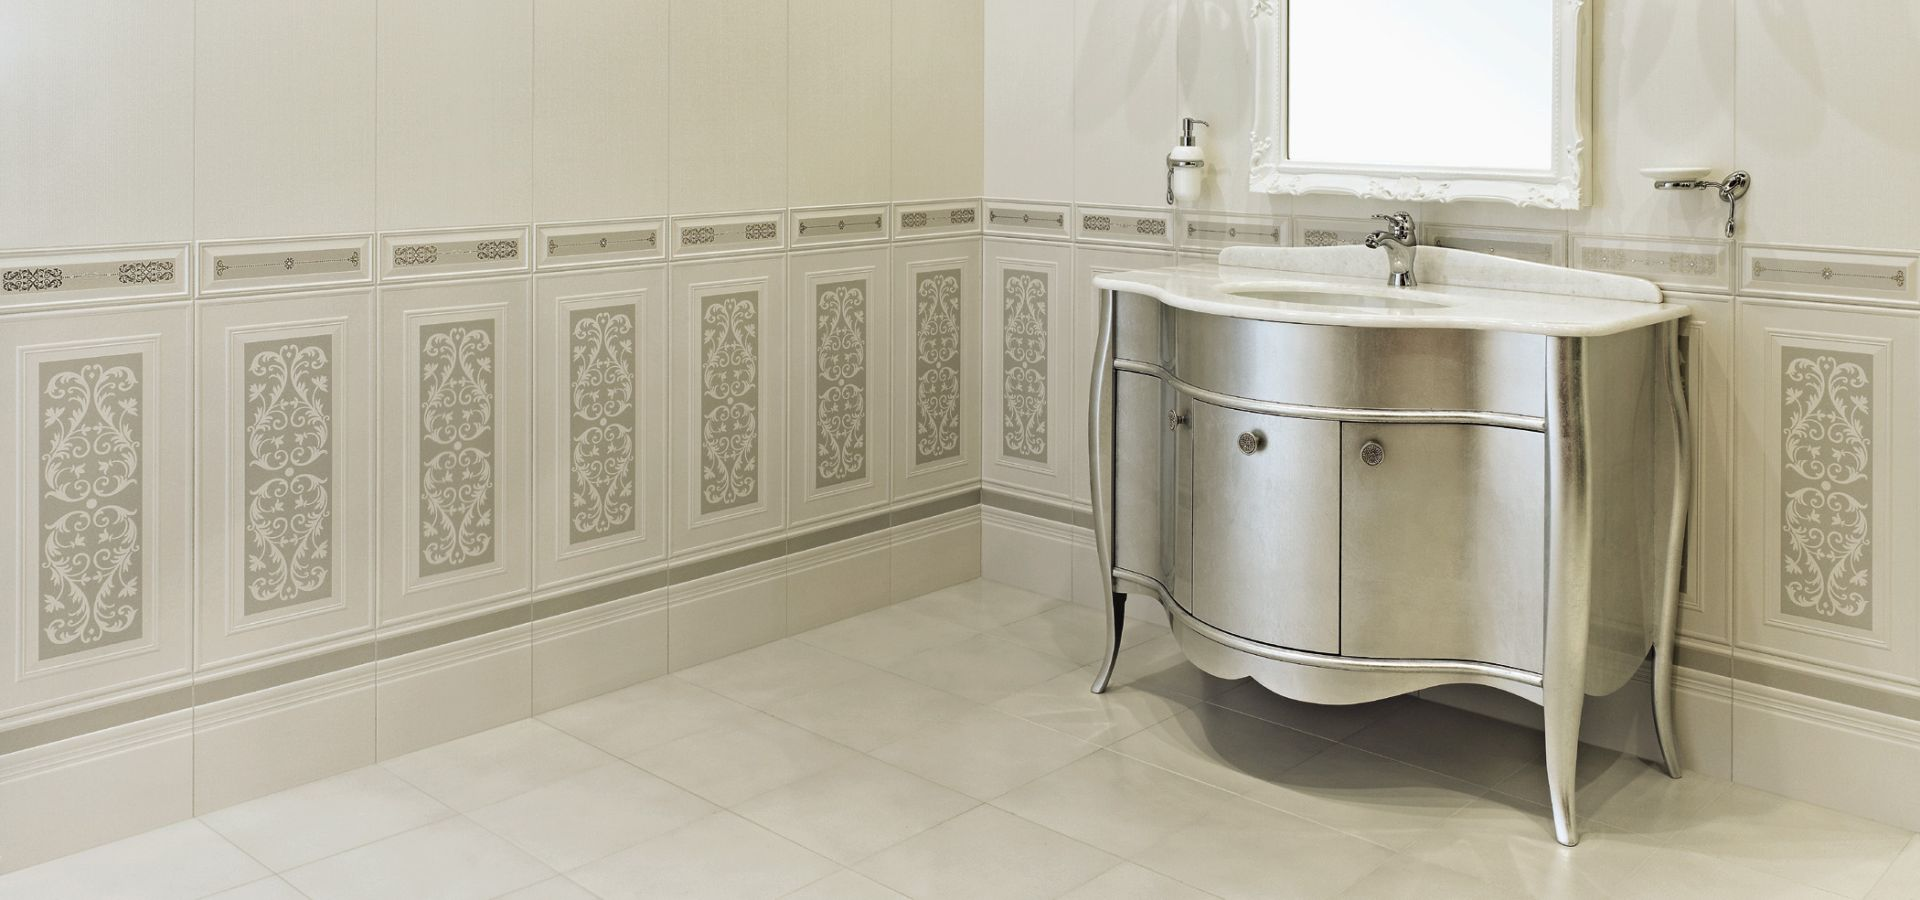 Boiserie bagno ceramica great ikea vasca da bagno for Boiserie in legno ikea